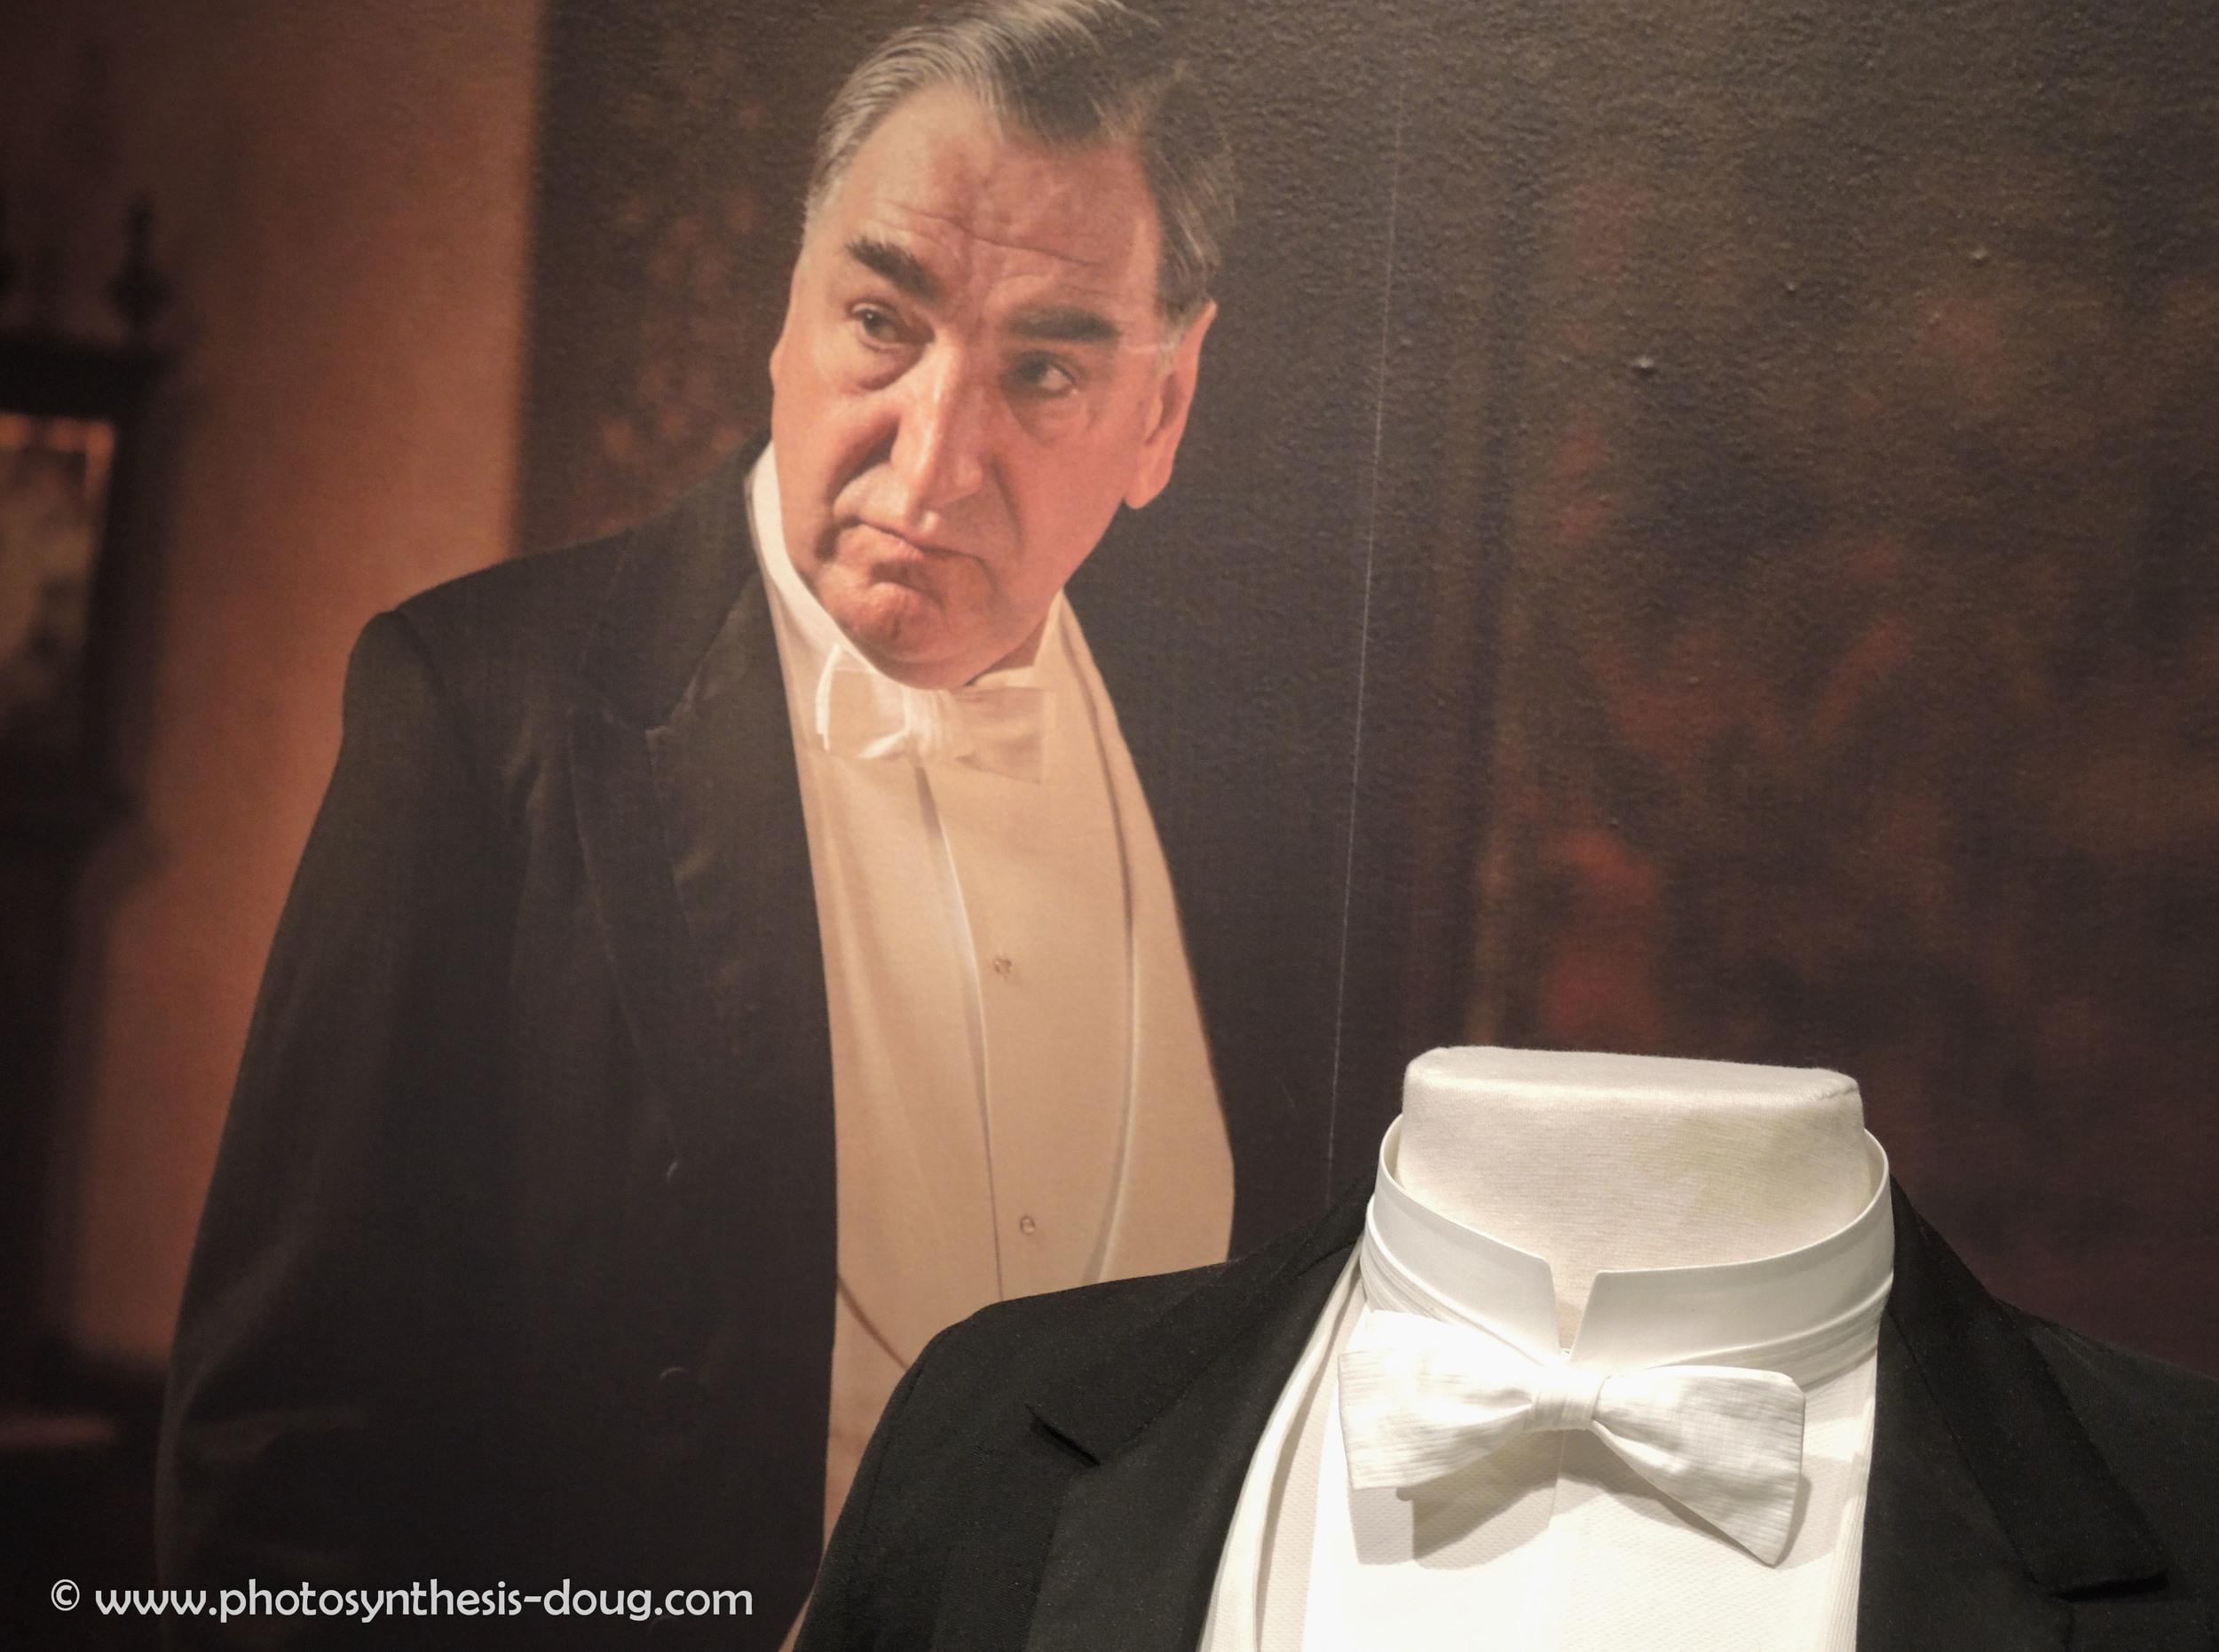 Downton Abbey Costume Exhibit, Winterthur, PA